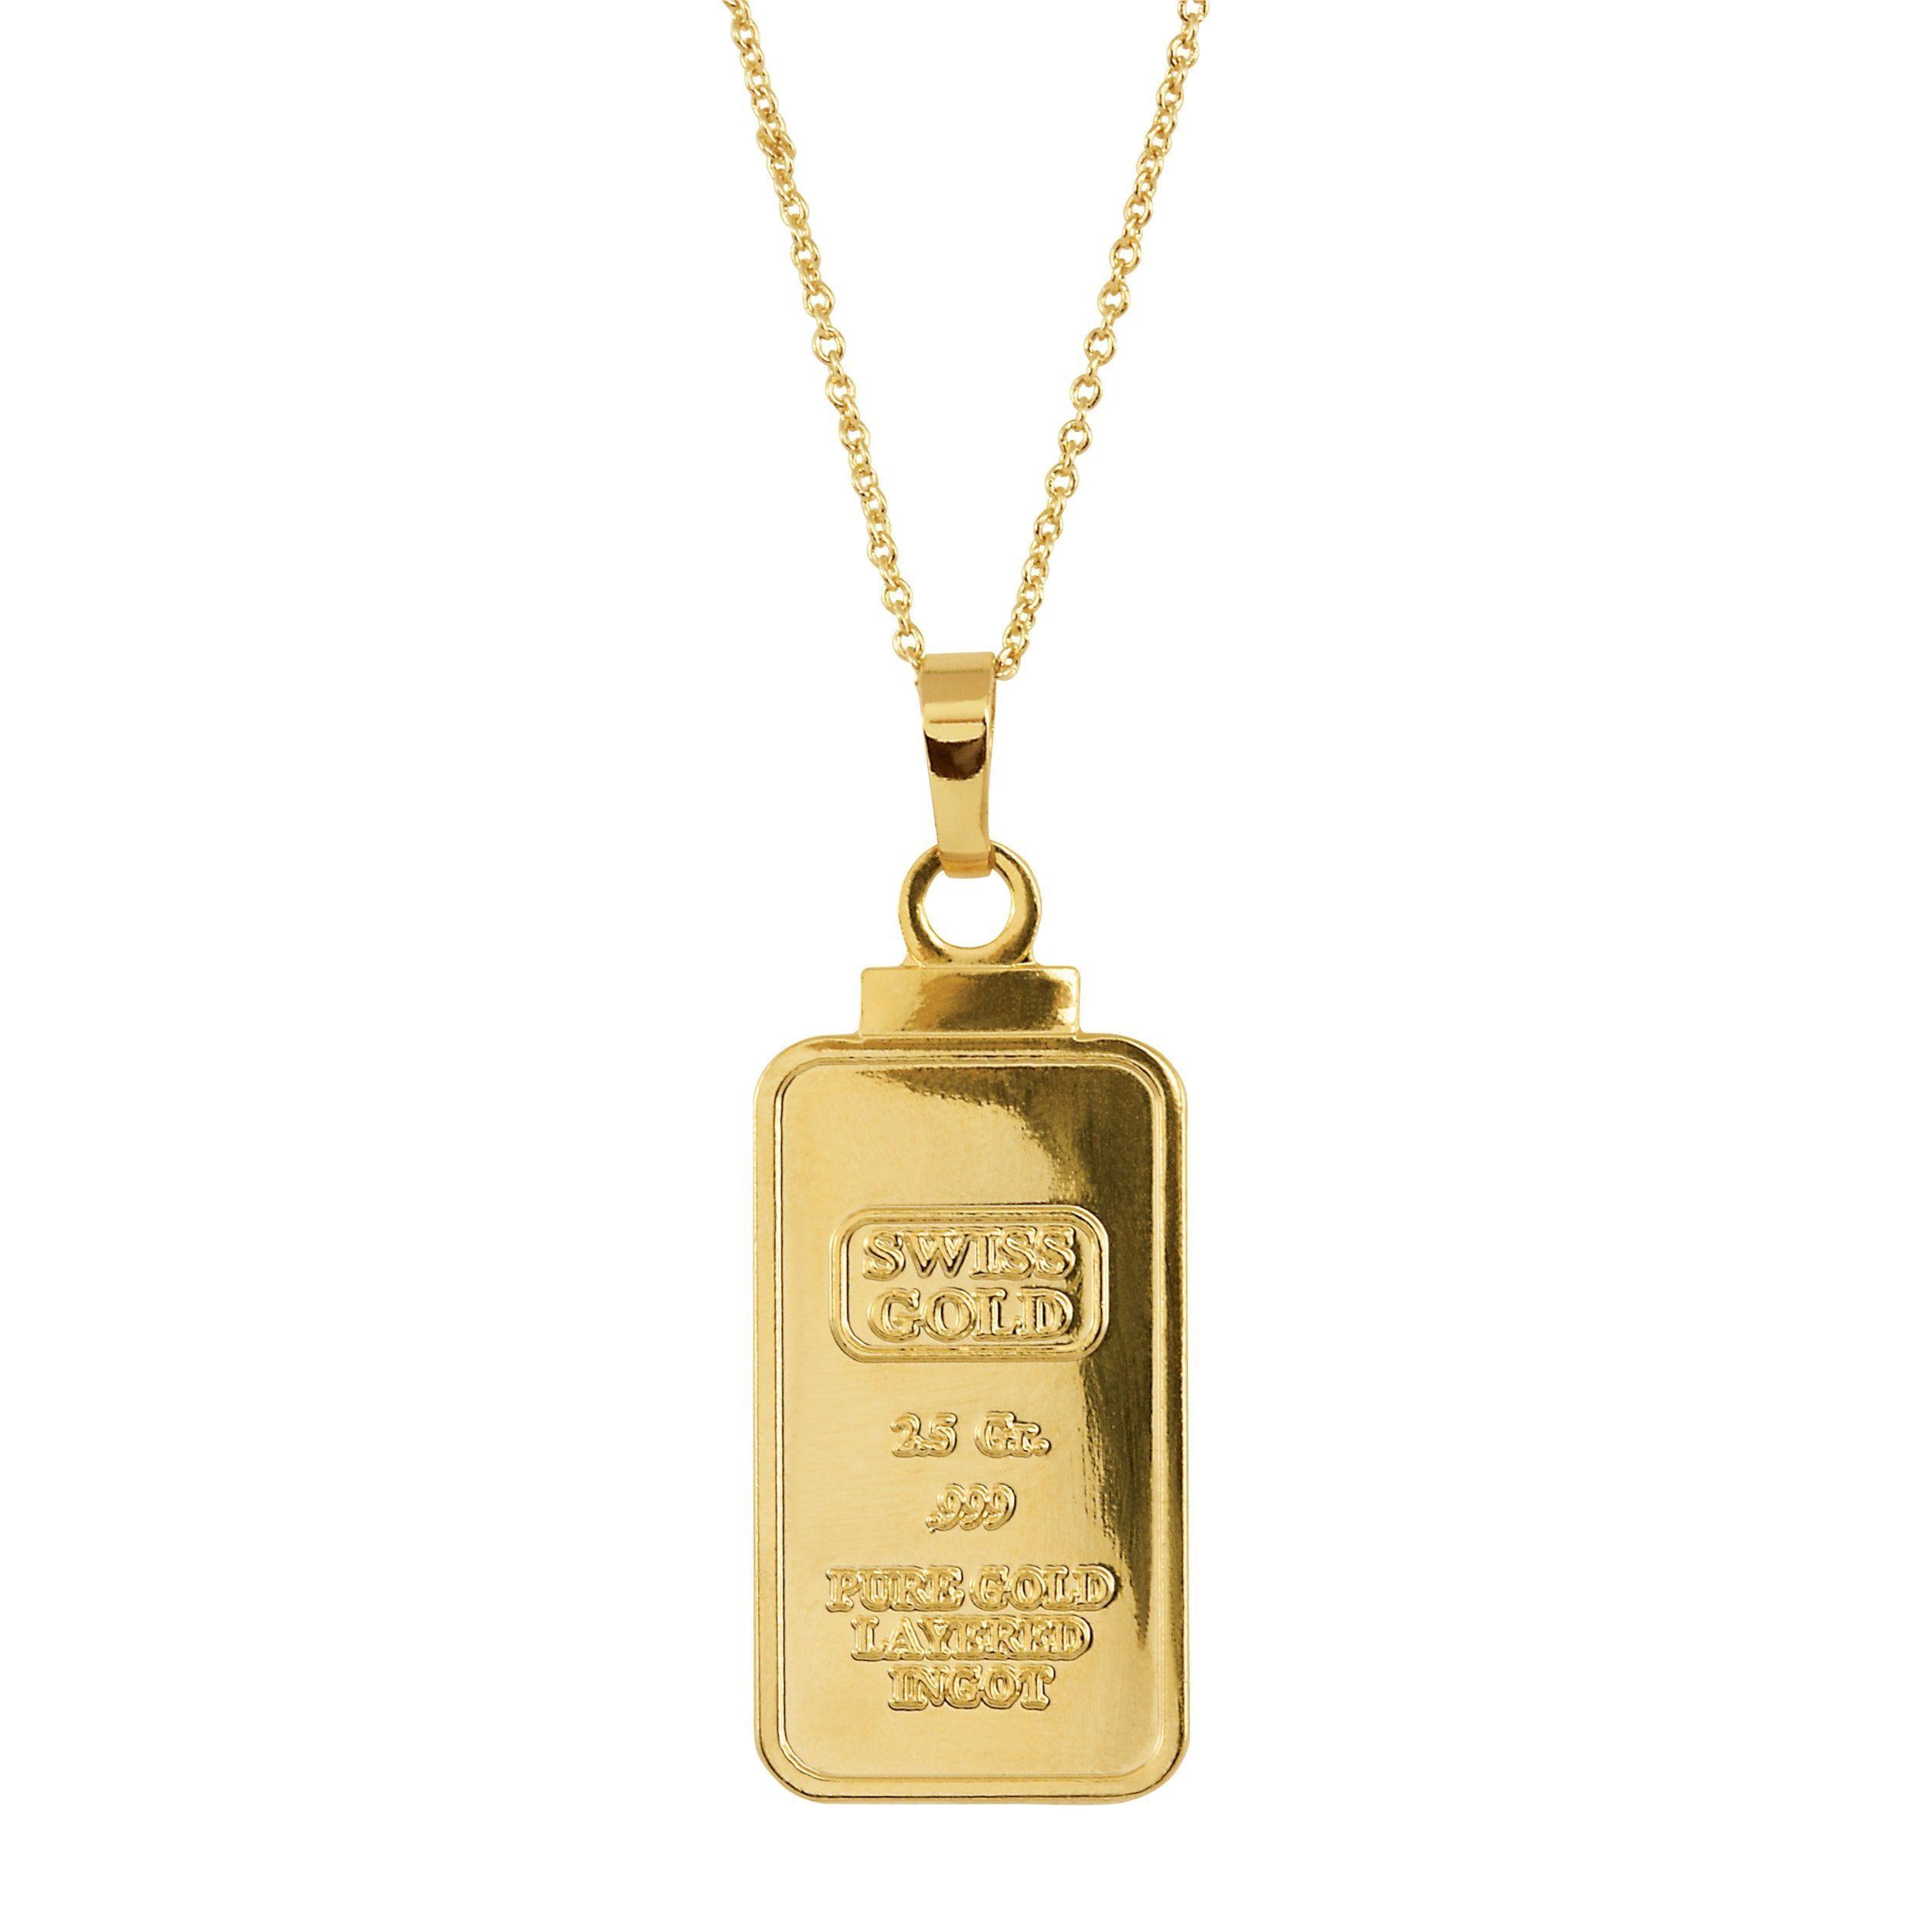 American Coin Treasures 2 5 Gram Swiss Ingot Replica Coin Pendant Layered In 24kt Gold Coin Pendant Jewelry Pendant